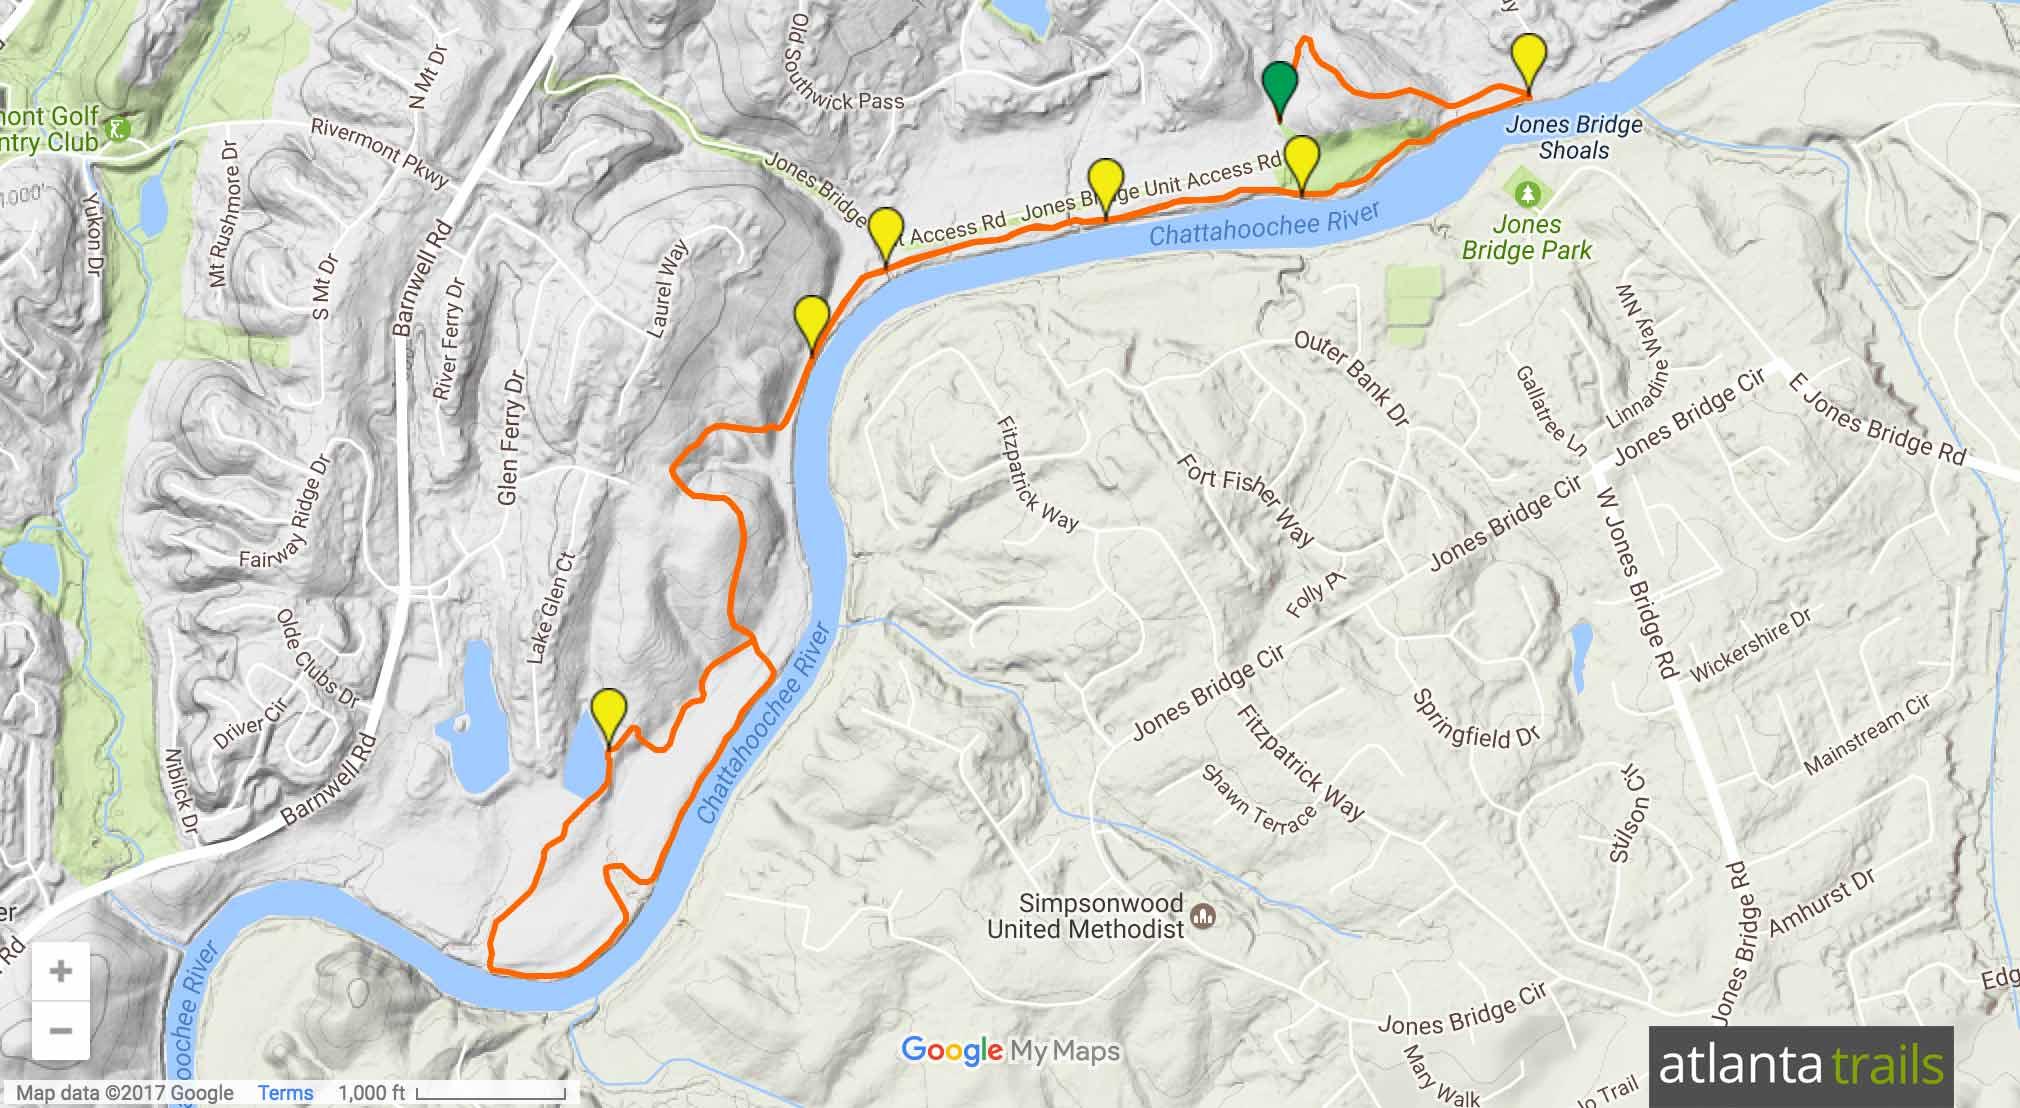 Jones Bridge Park Trail Map